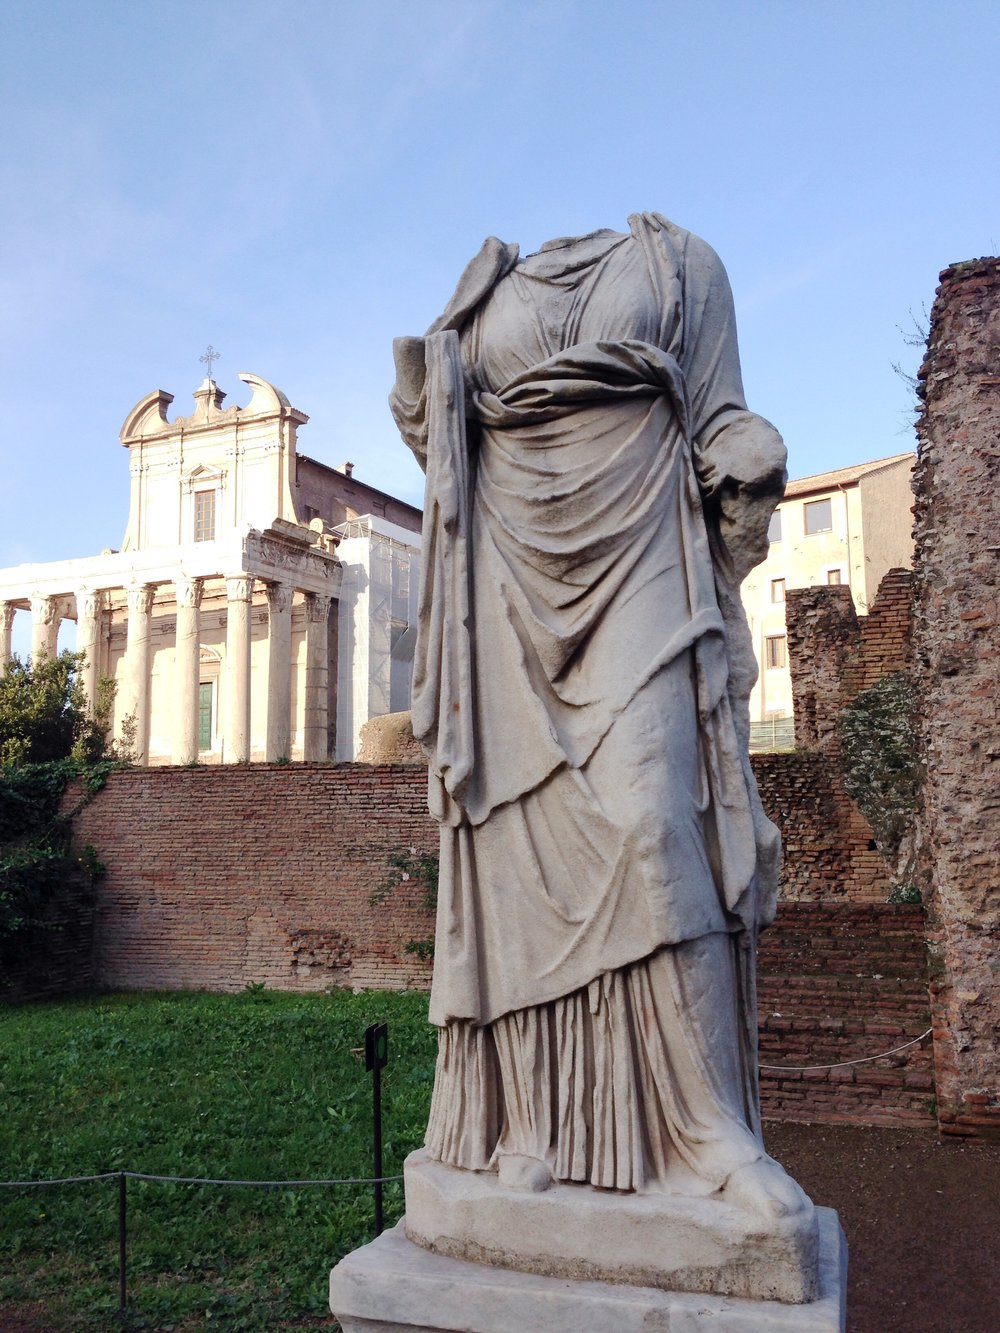 Statue of a Vestal Virgin Roman Forum, Rome, Italy